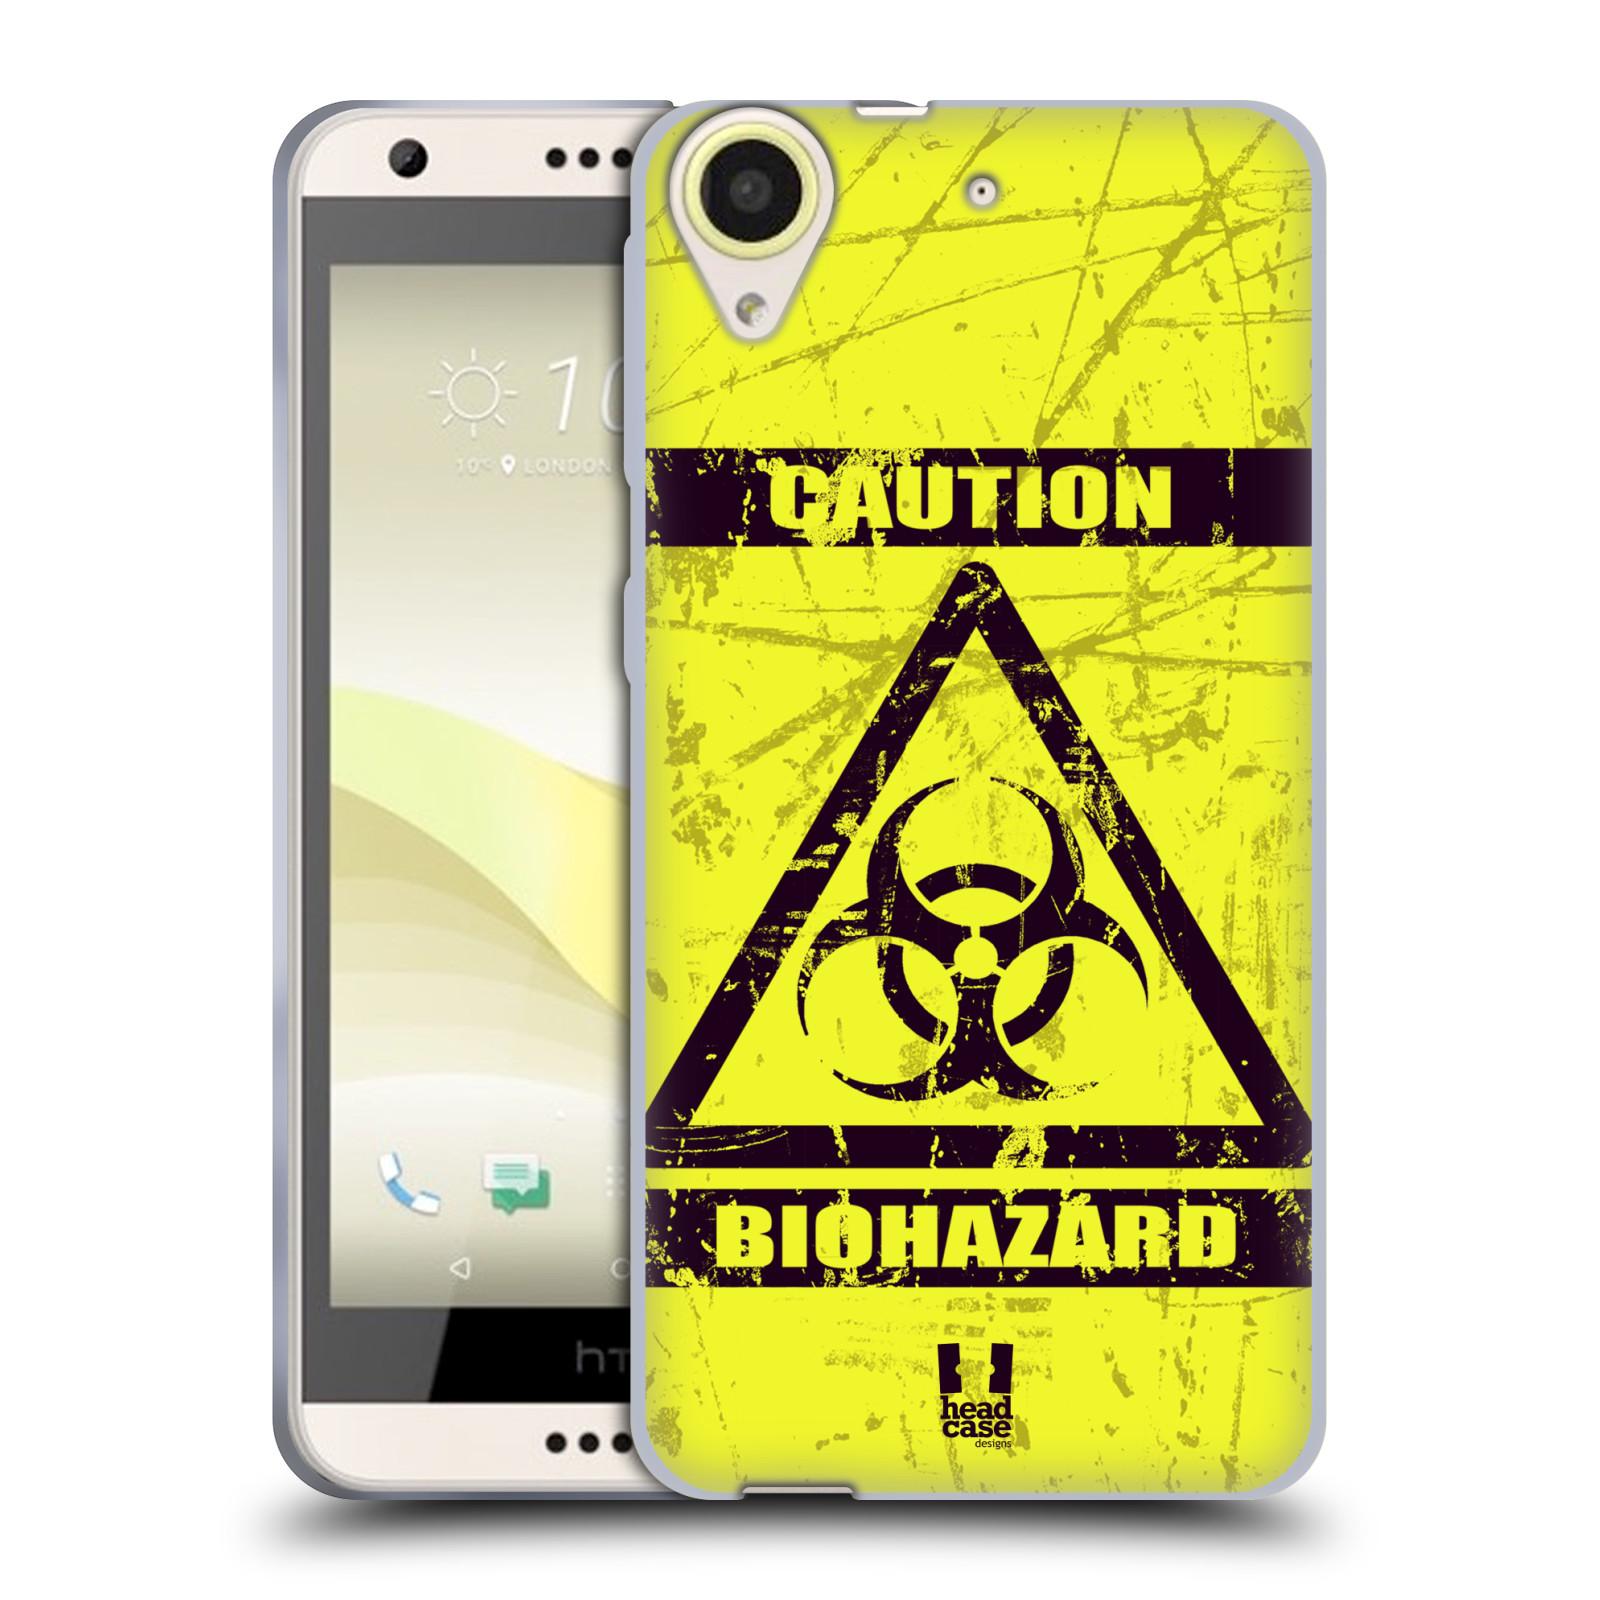 Silikonové pouzdro na mobil HTC Desire 650 HEAD CASE BIOHAZARD (Silikonový kryt či obal na mobilní telefon HTC Desire 650)